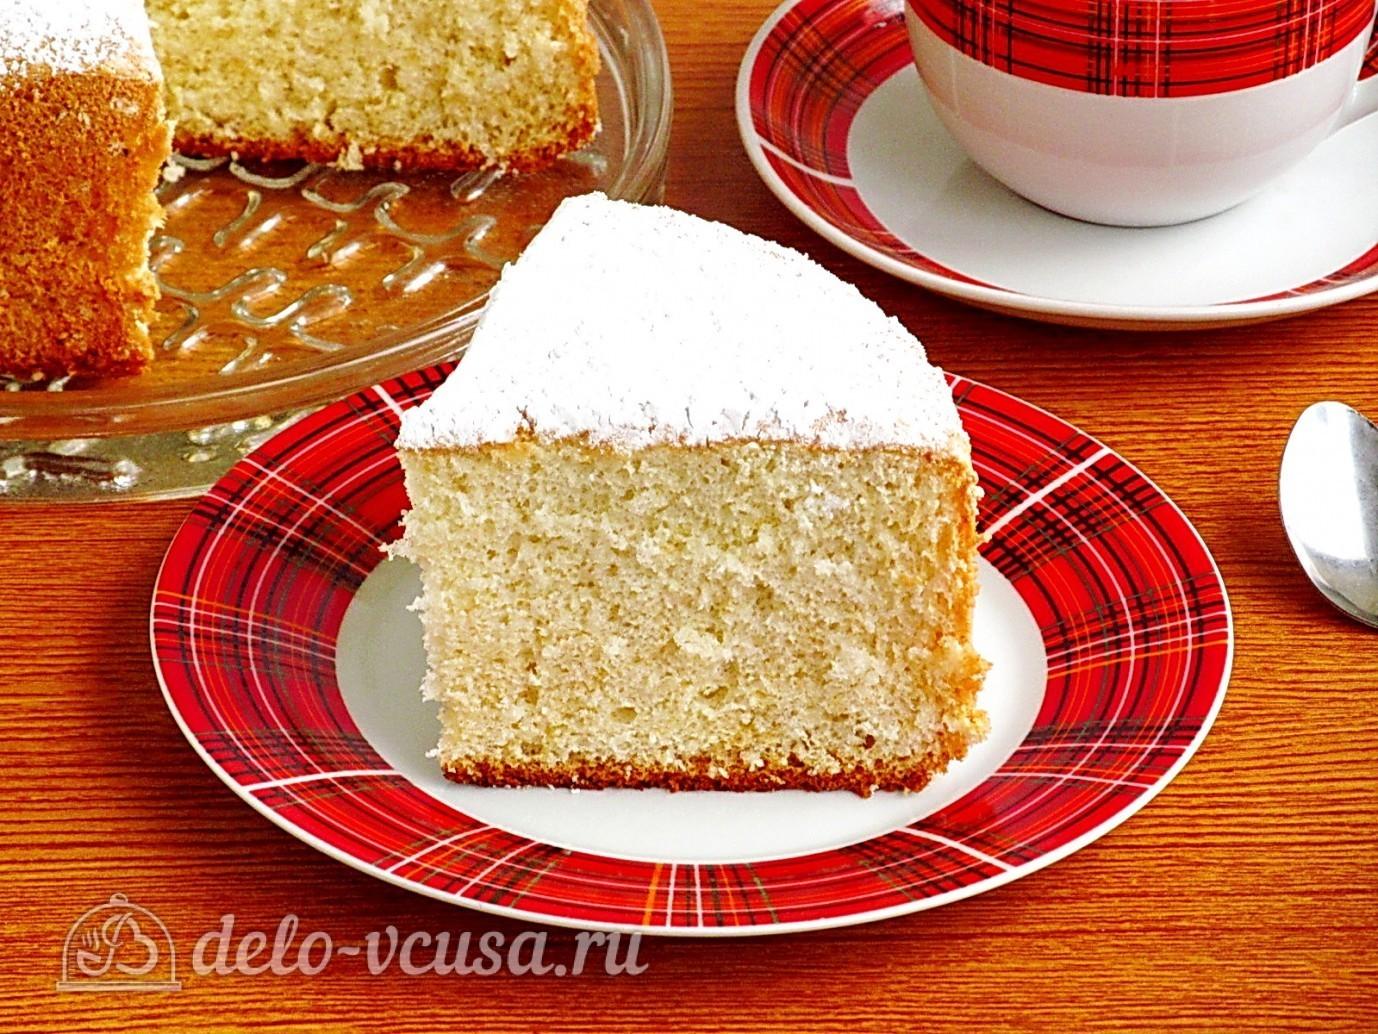 Фото рецепт коржей для торта